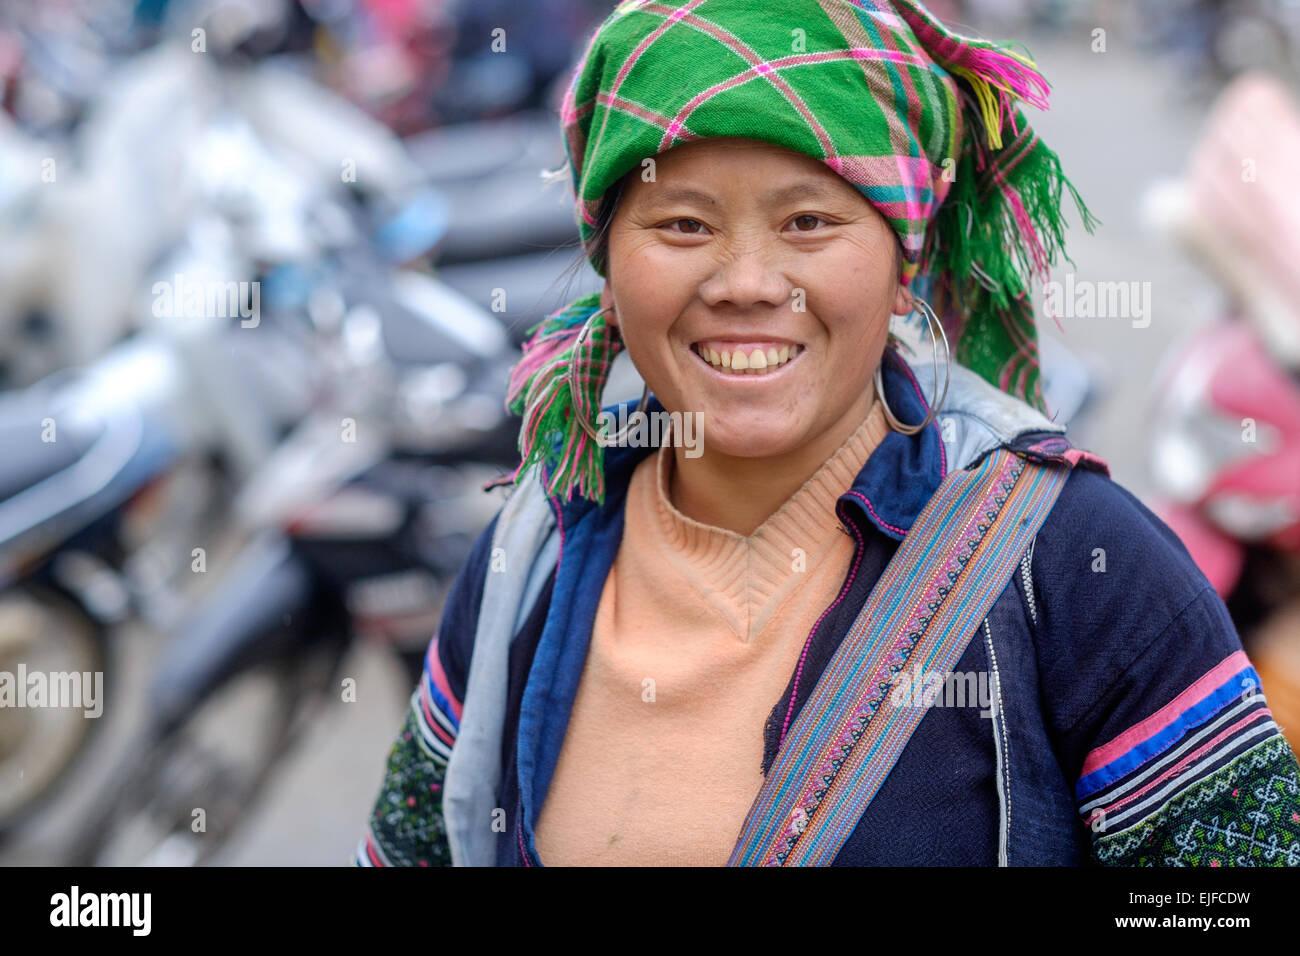 Hmong woman at a market in Sapa, Vietnam Stock Photo